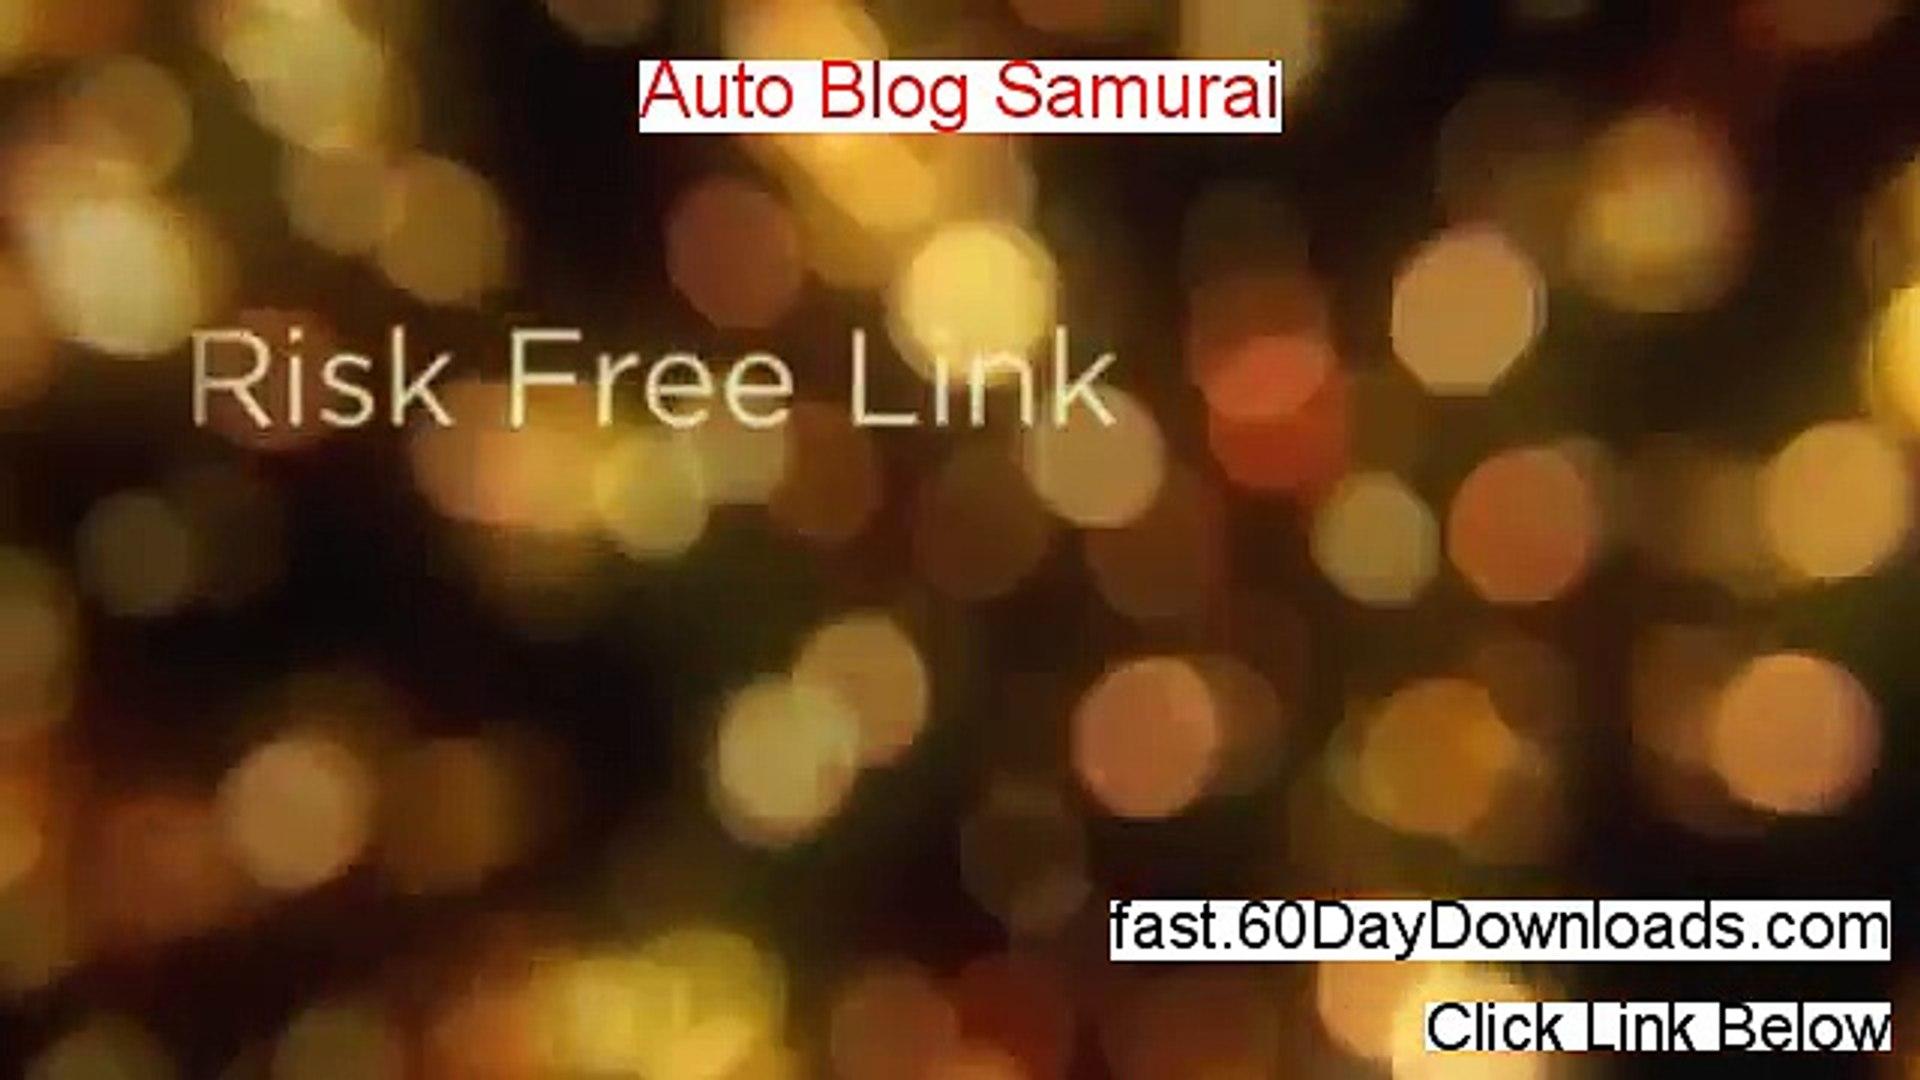 Auto Blog Samurai Pro - Auto Blog Samurai Software